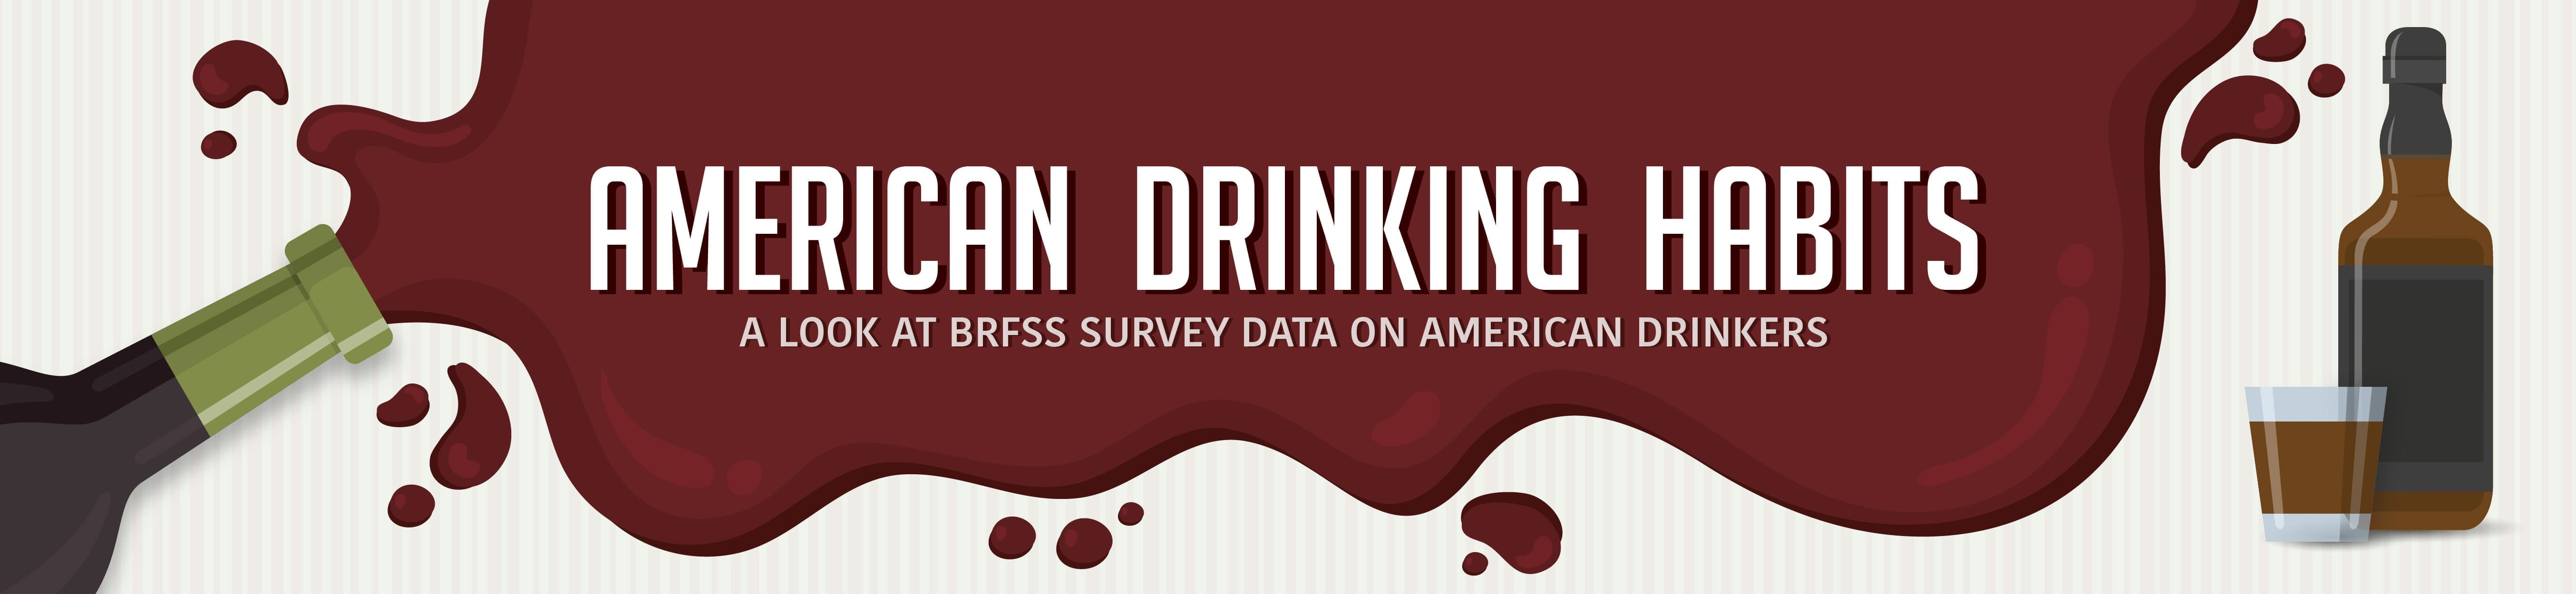 american-drinking-habits